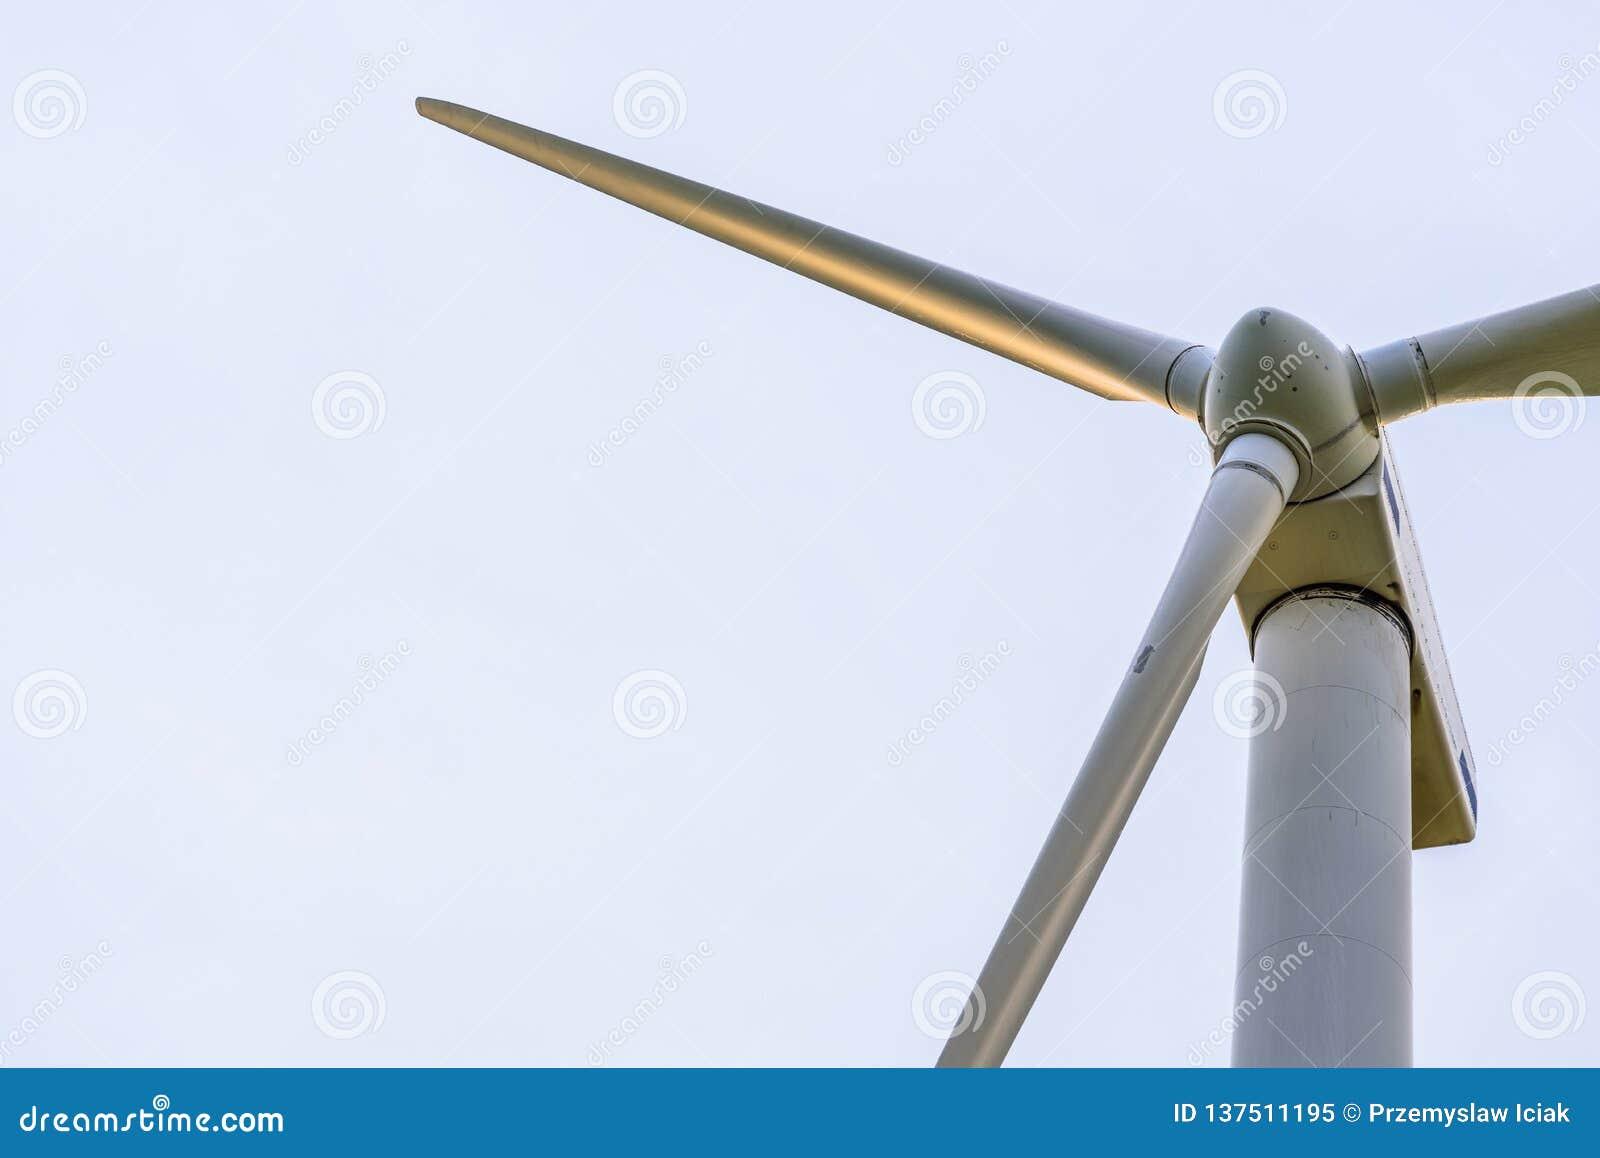 Wind turbine close up view on a blue sky